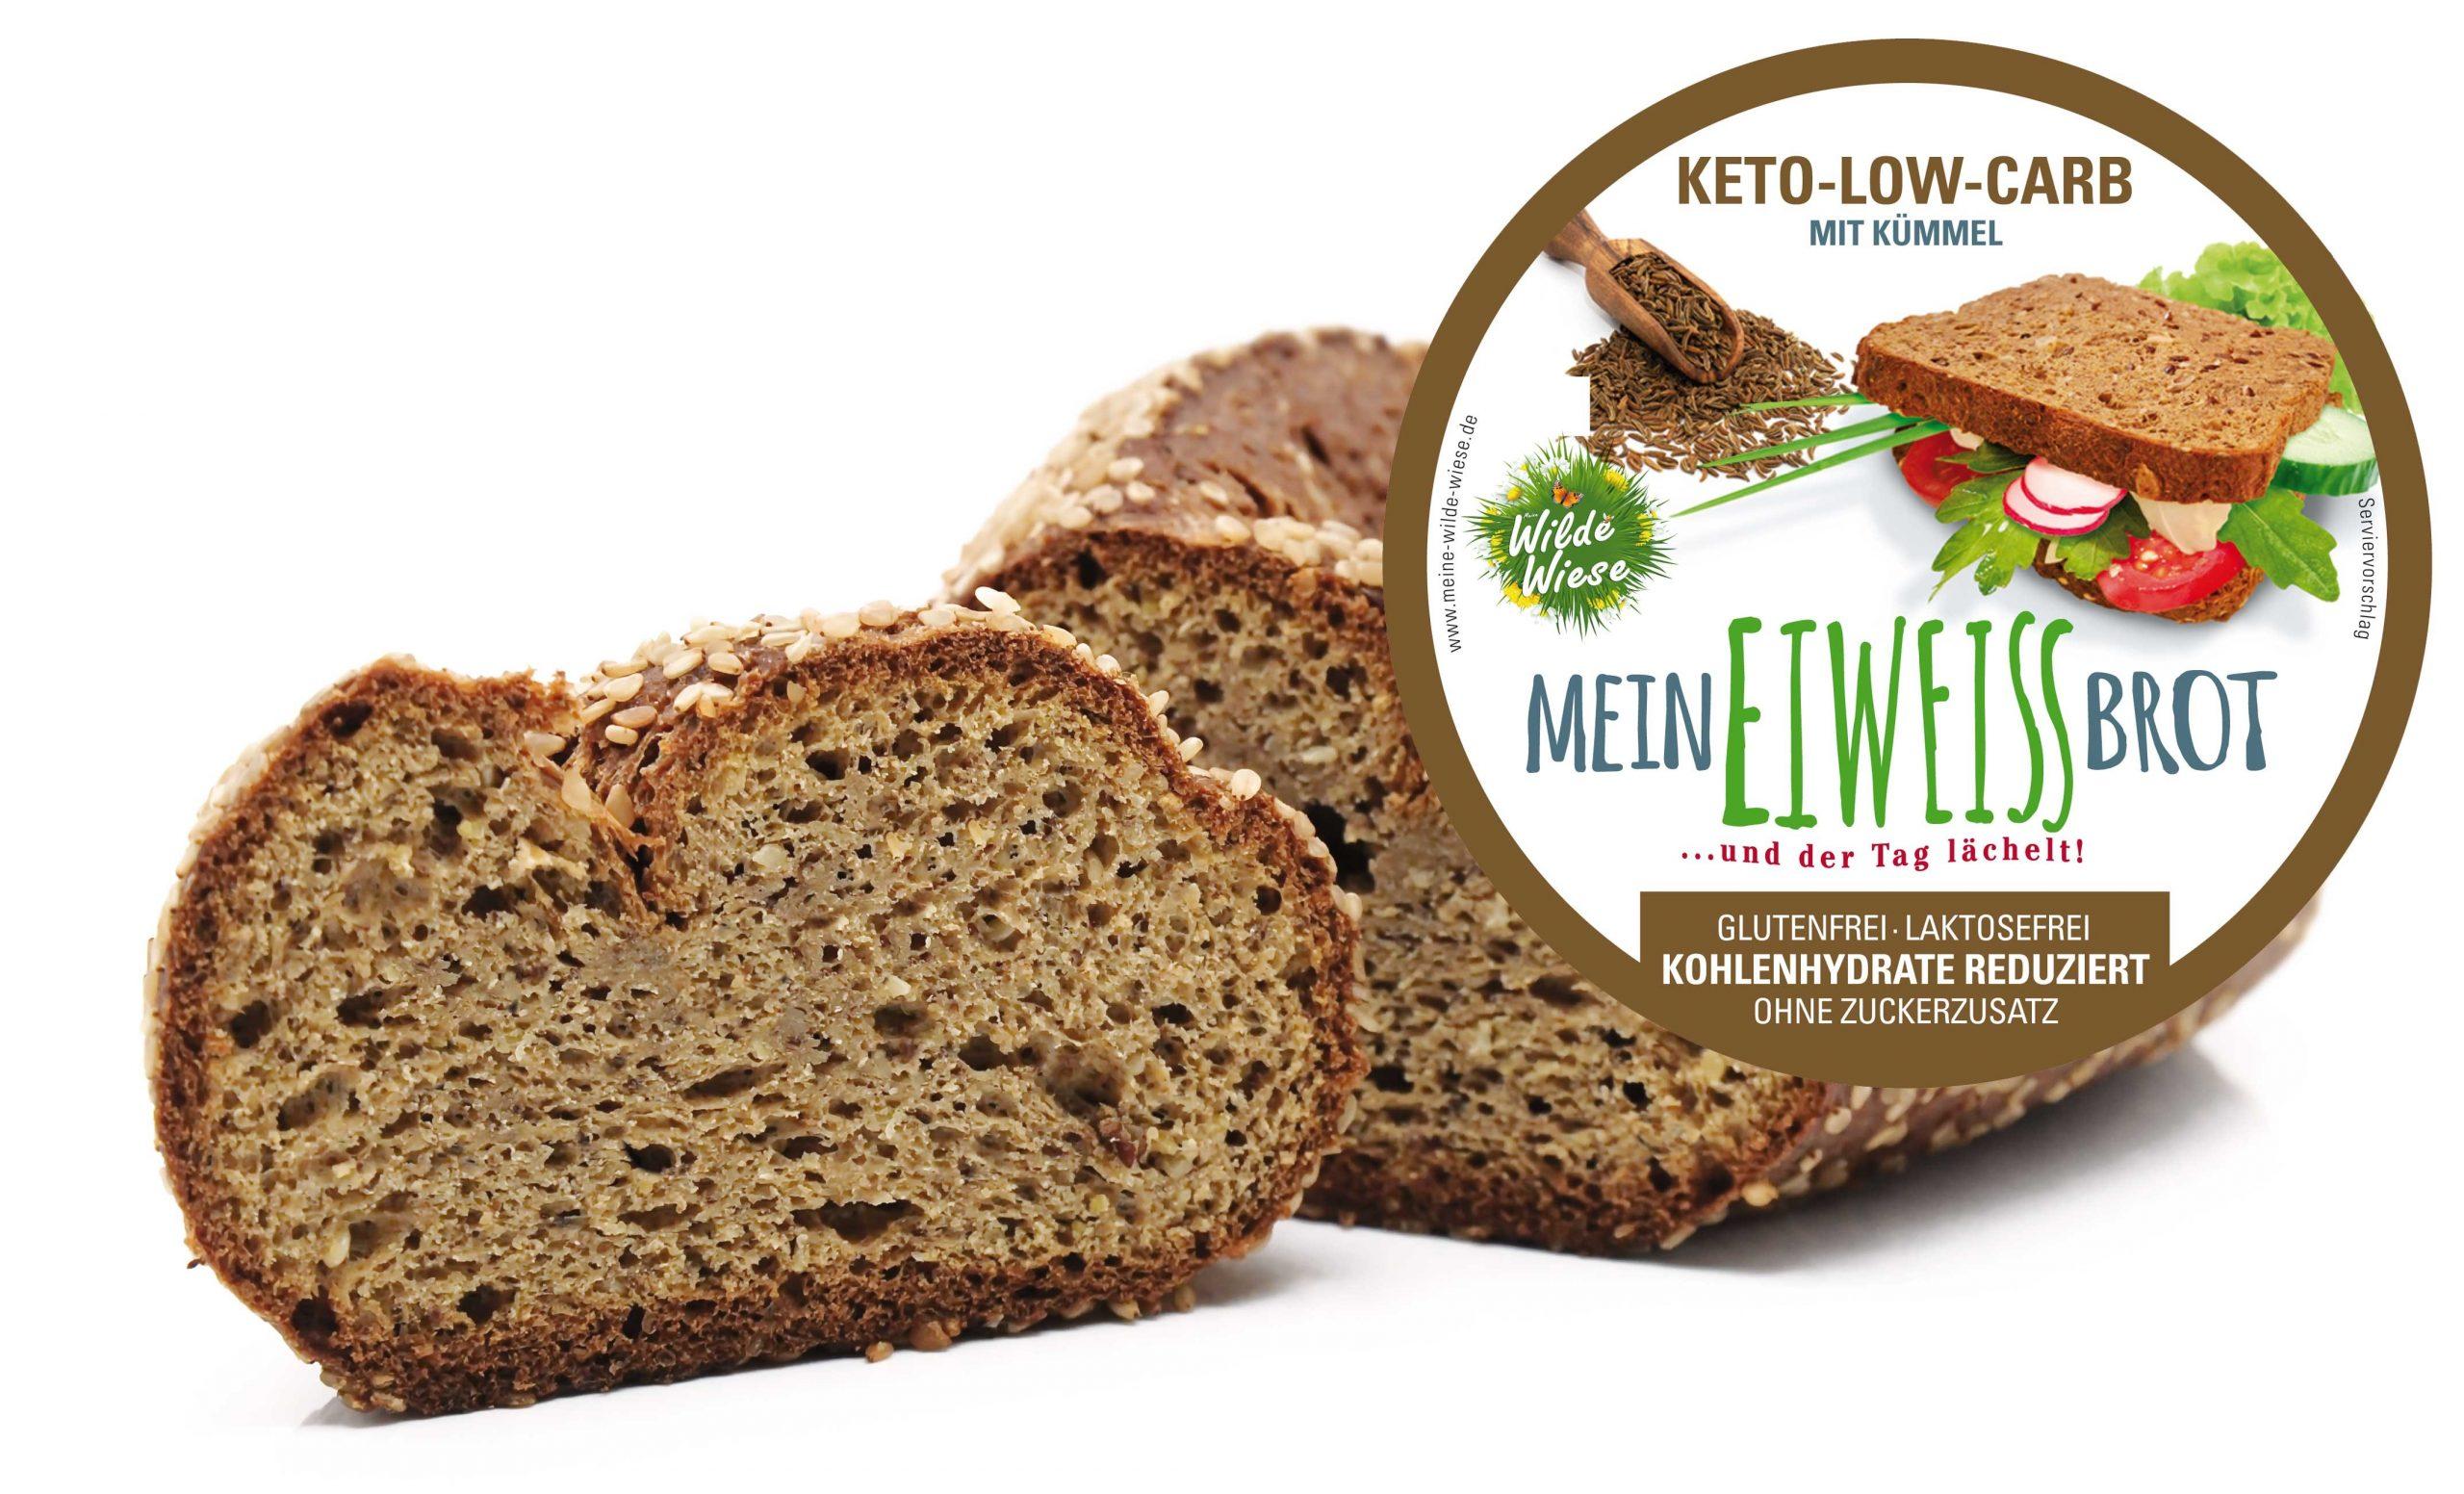 Wilde Wiese Eiweißbrot - Kümmel Geschmack - Keto / Low Carb / Diabetiker Brot / Glutenfrei / Zuckerfrei / Vegan